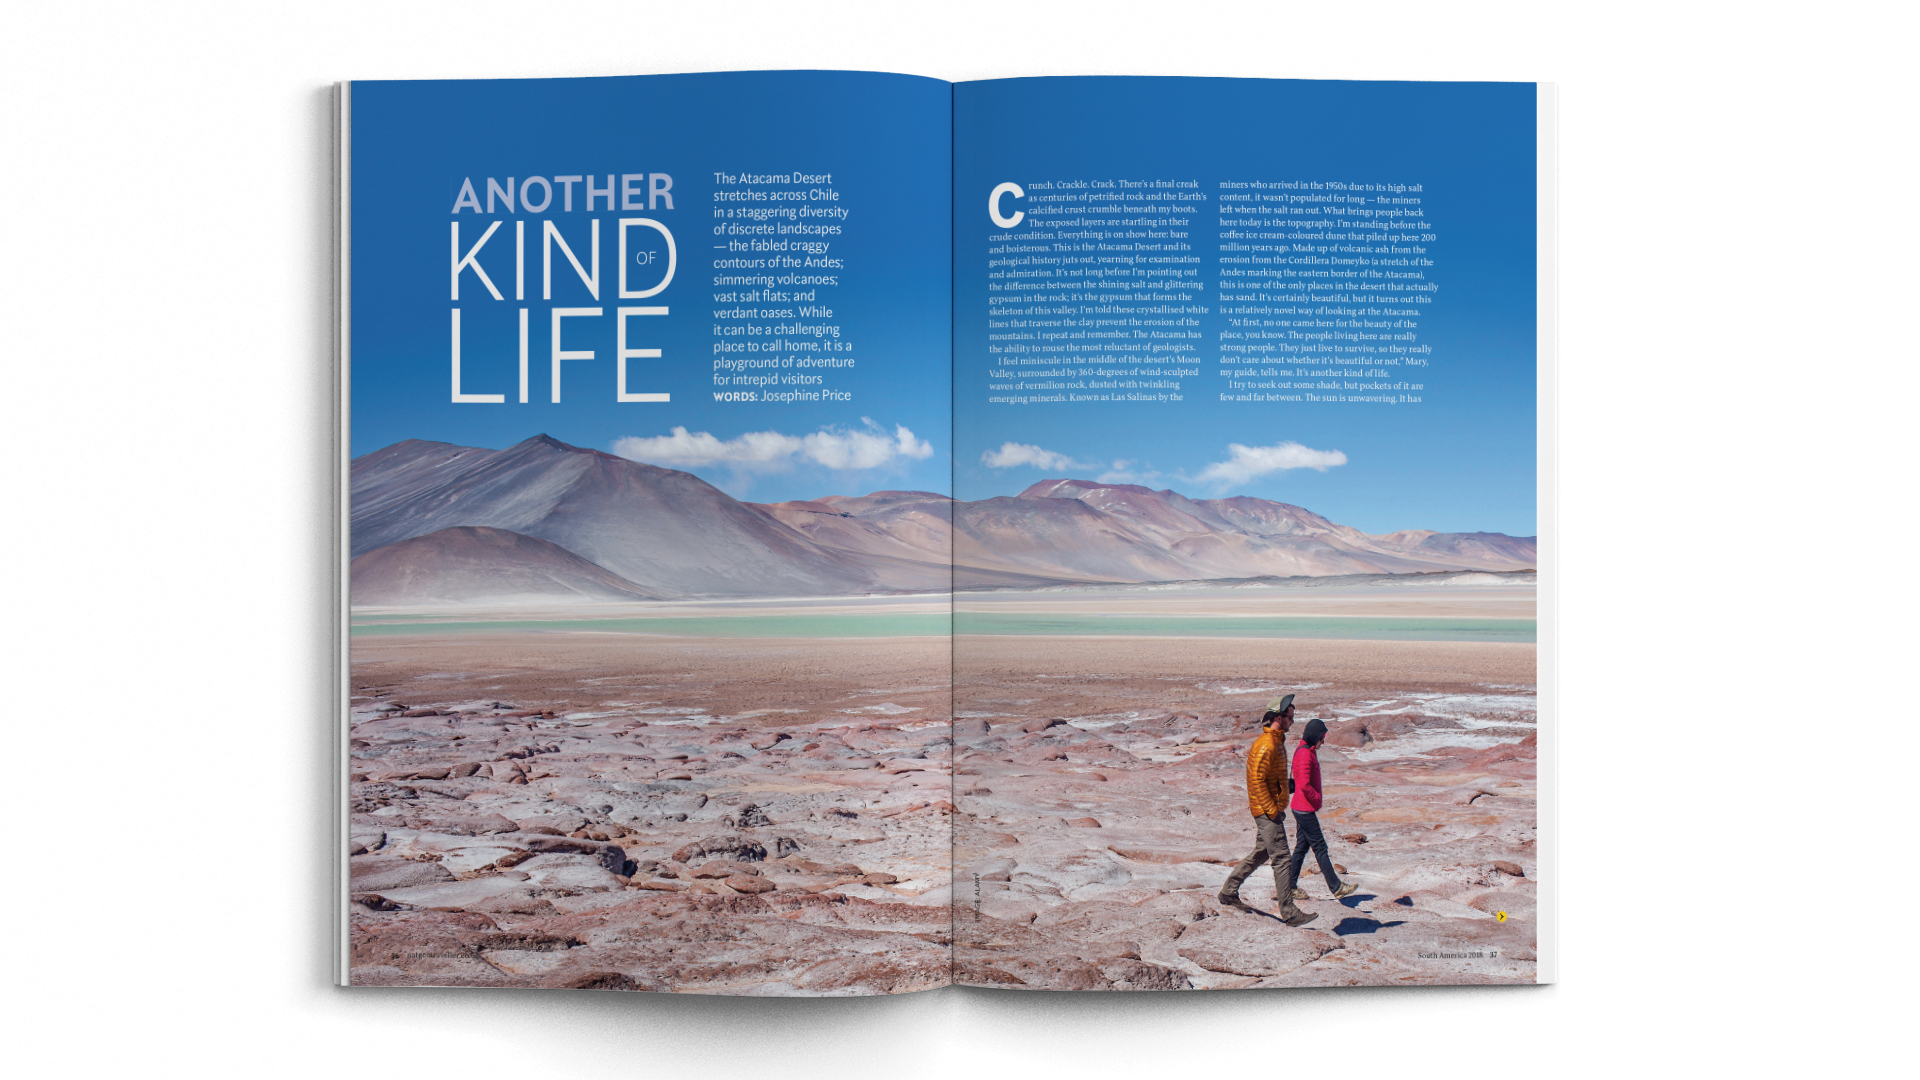 A4-Magazine-DPS-NGT-SA-Atacama-1